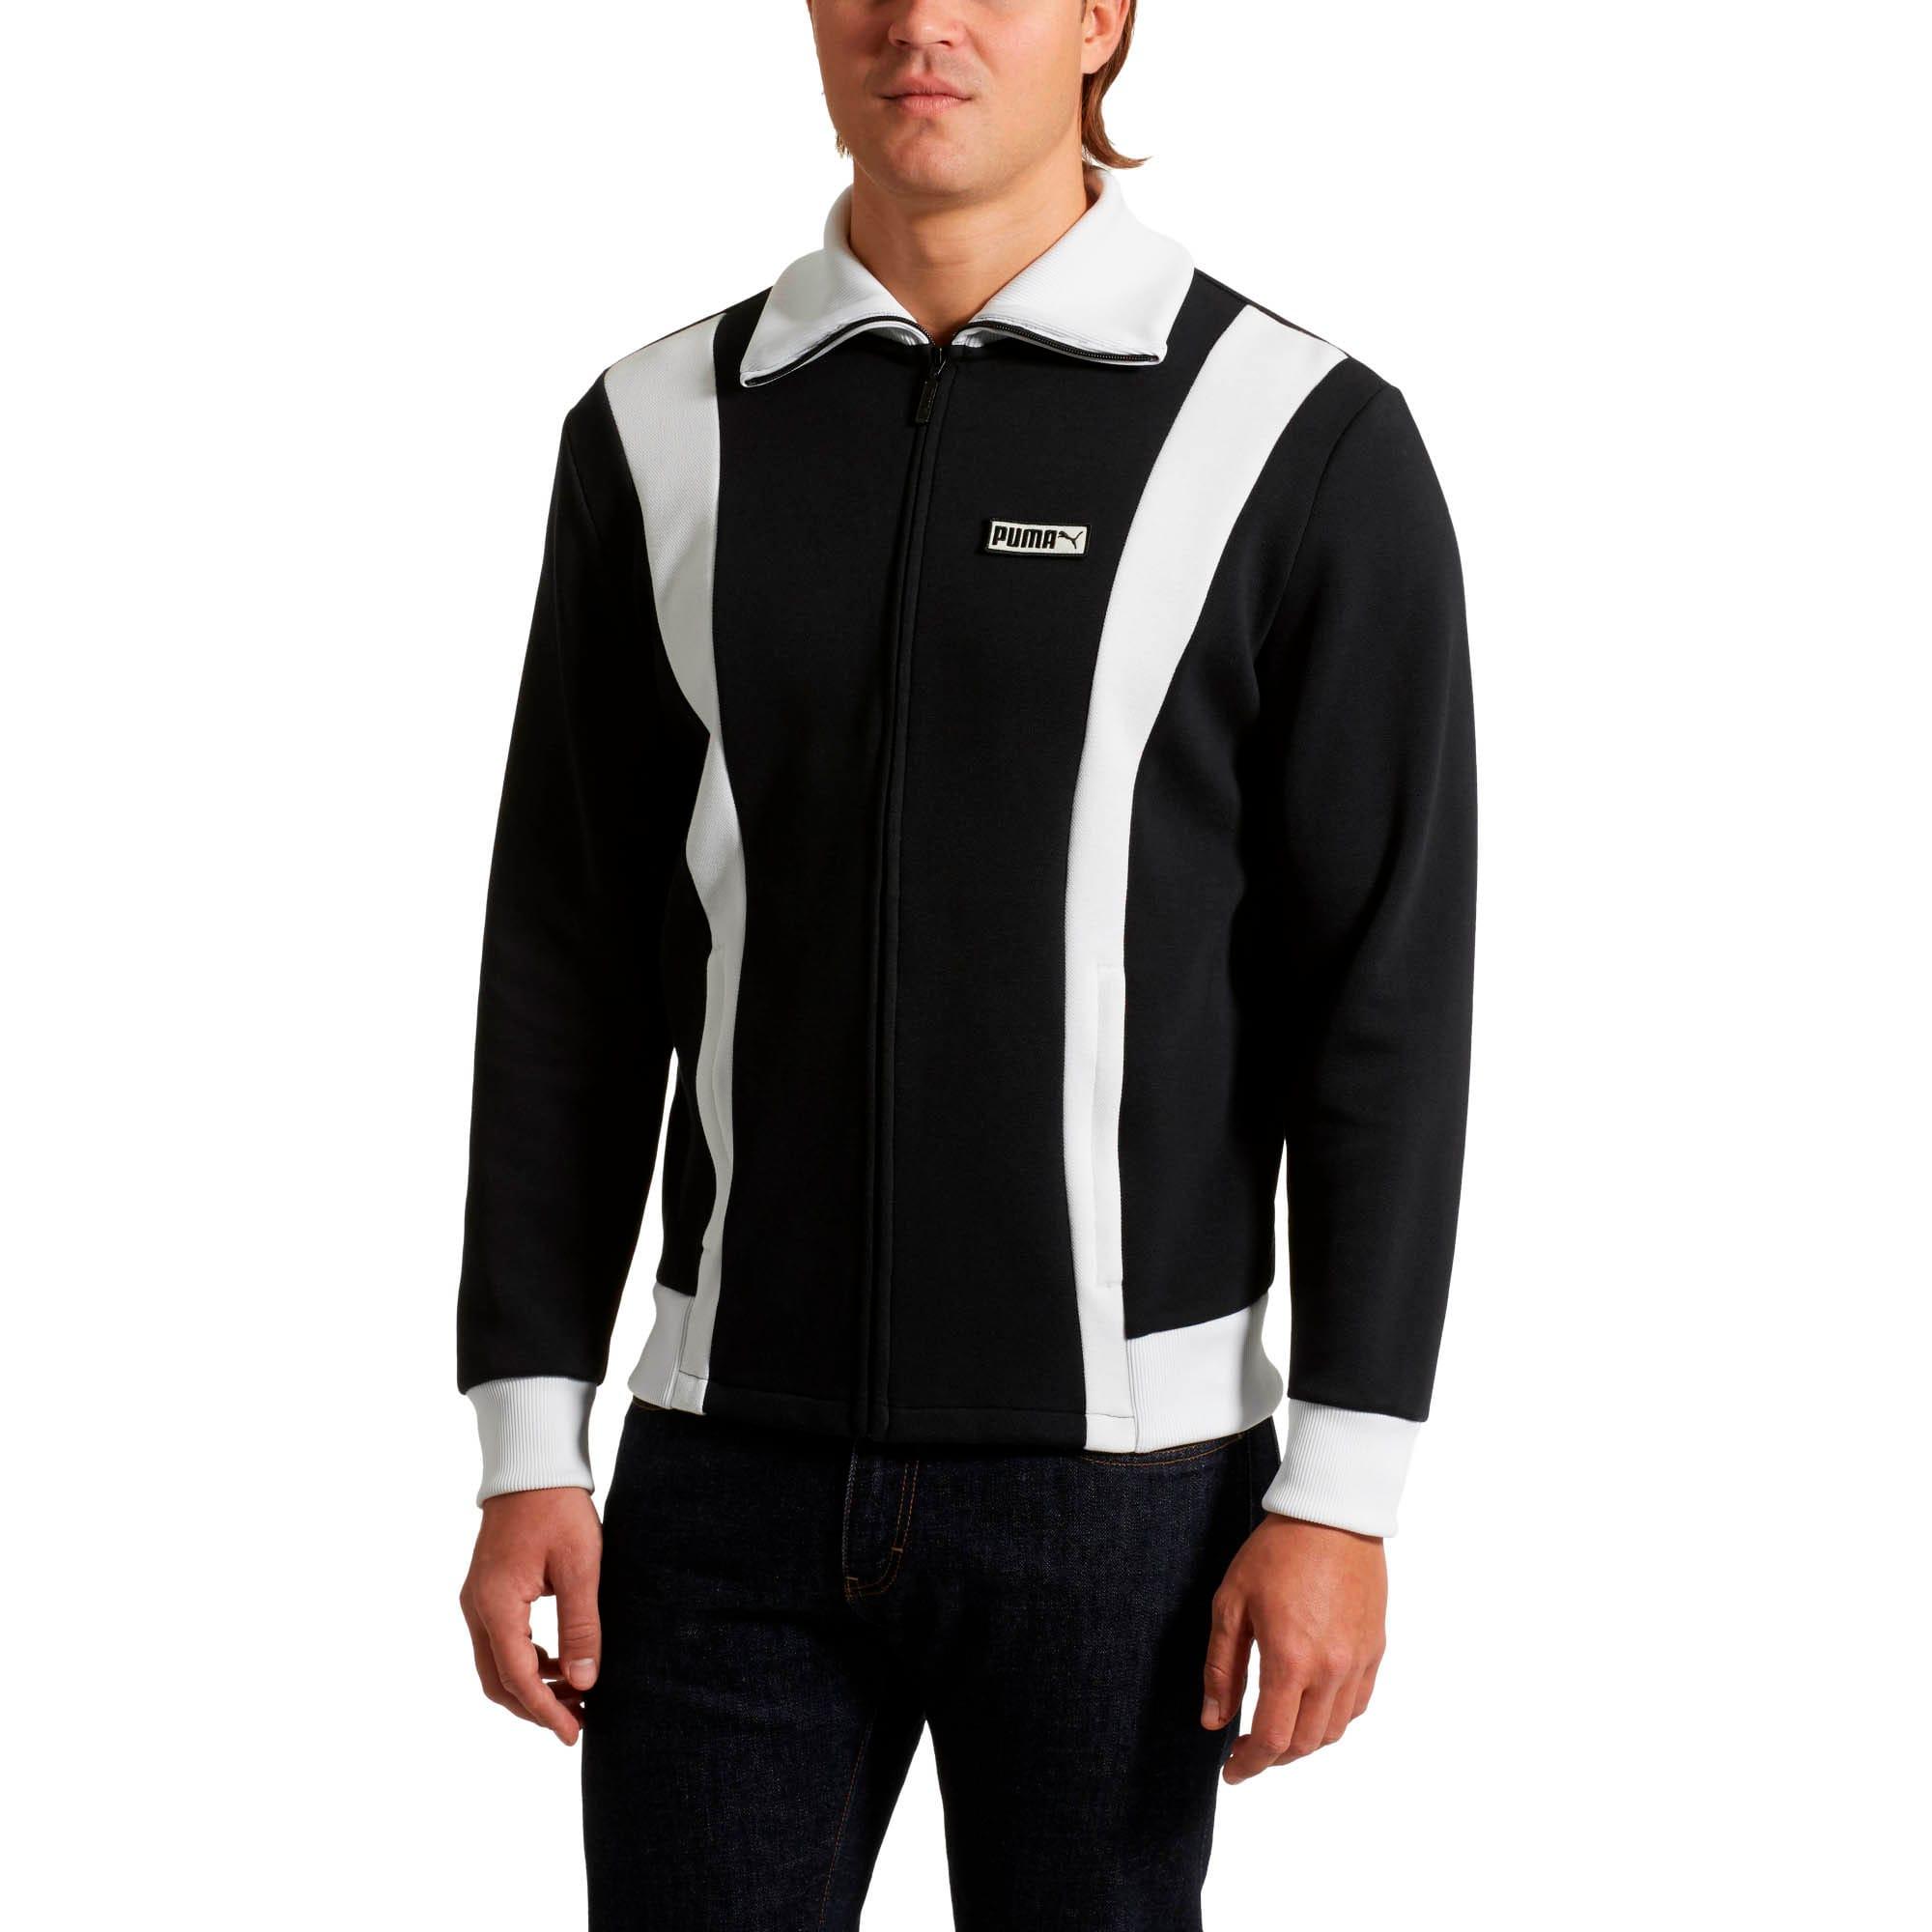 Thumbnail 2 of Iconic T7 Spezial Men's Track Jacket, Cotton Black, medium